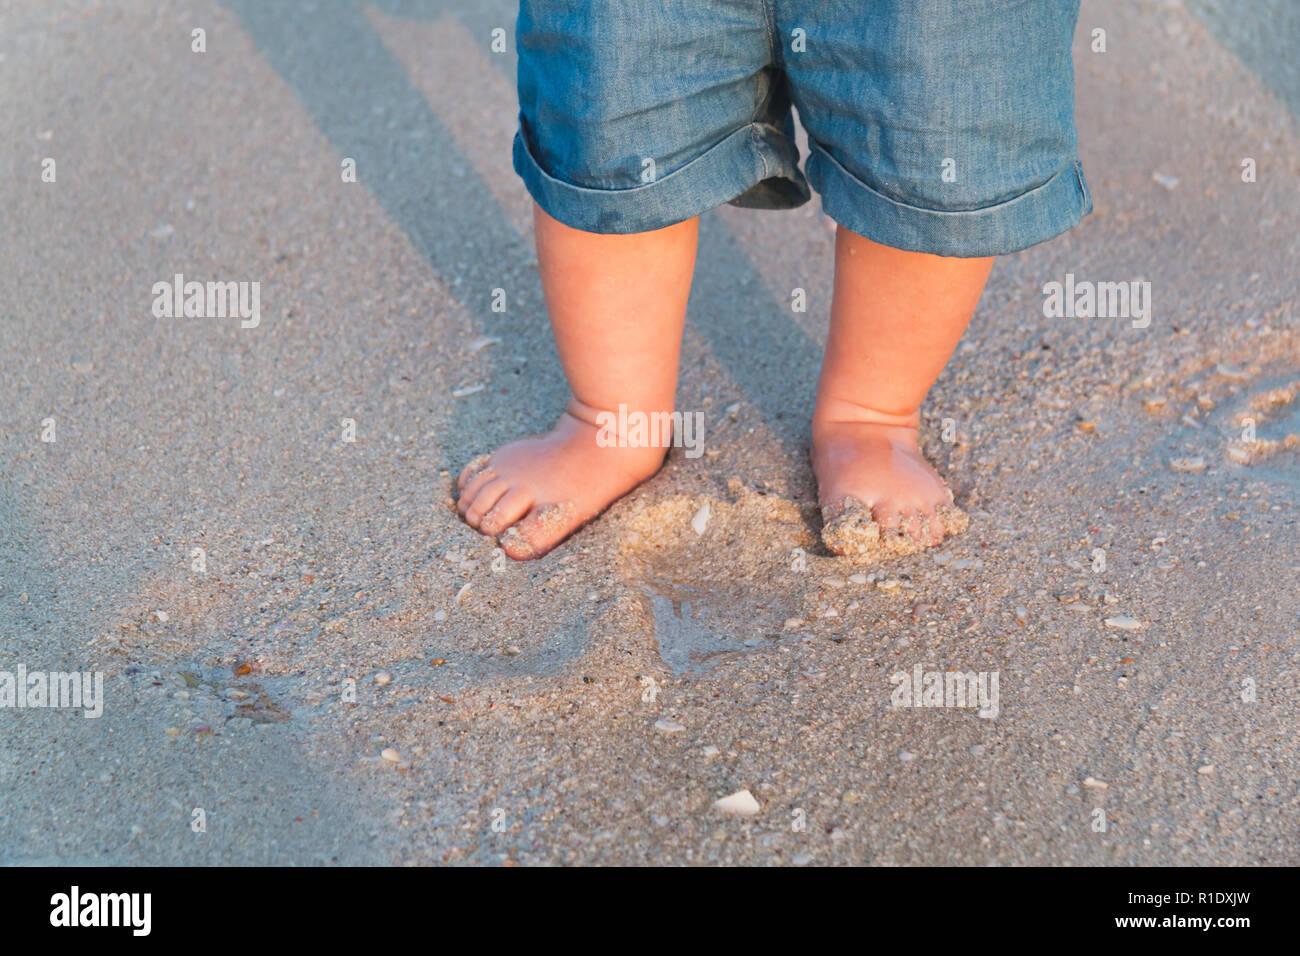 64793e4dbc03 Bare feet walking at sandy beach near the sea. Little baby in blue jeans  shorts